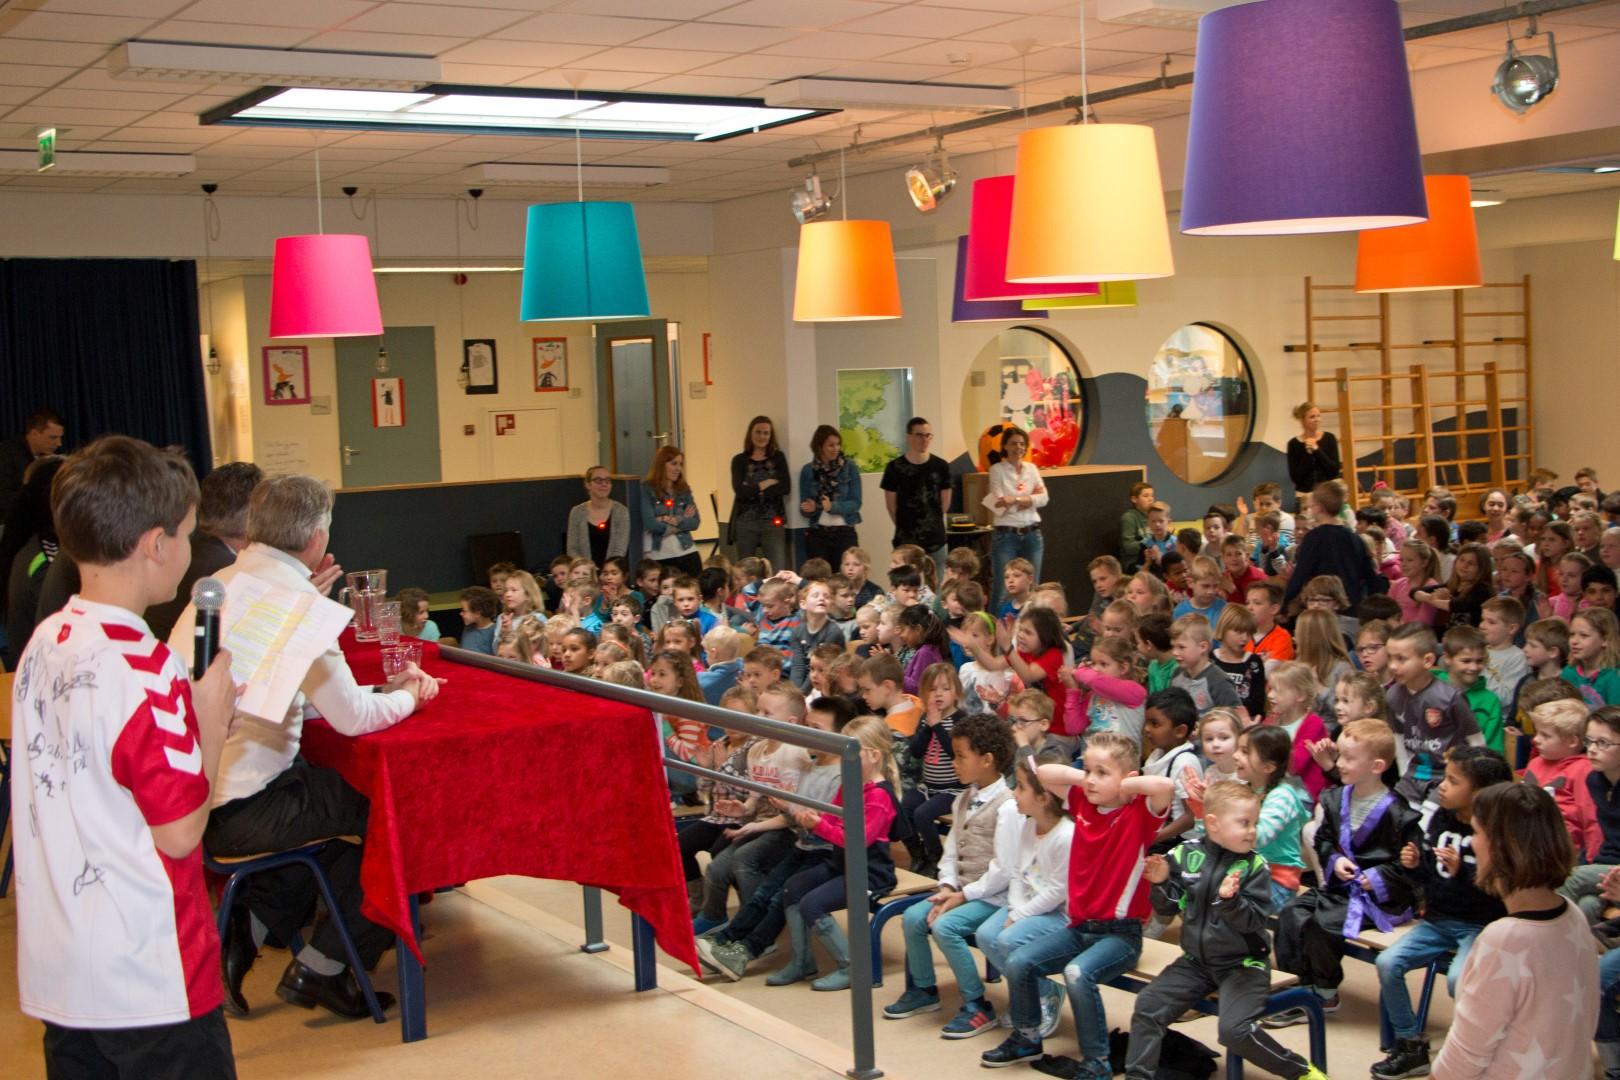 Basisschool De Fontein.Fc Utrecht Geeft Gastles Op Basisschool De Fontein Onshouten